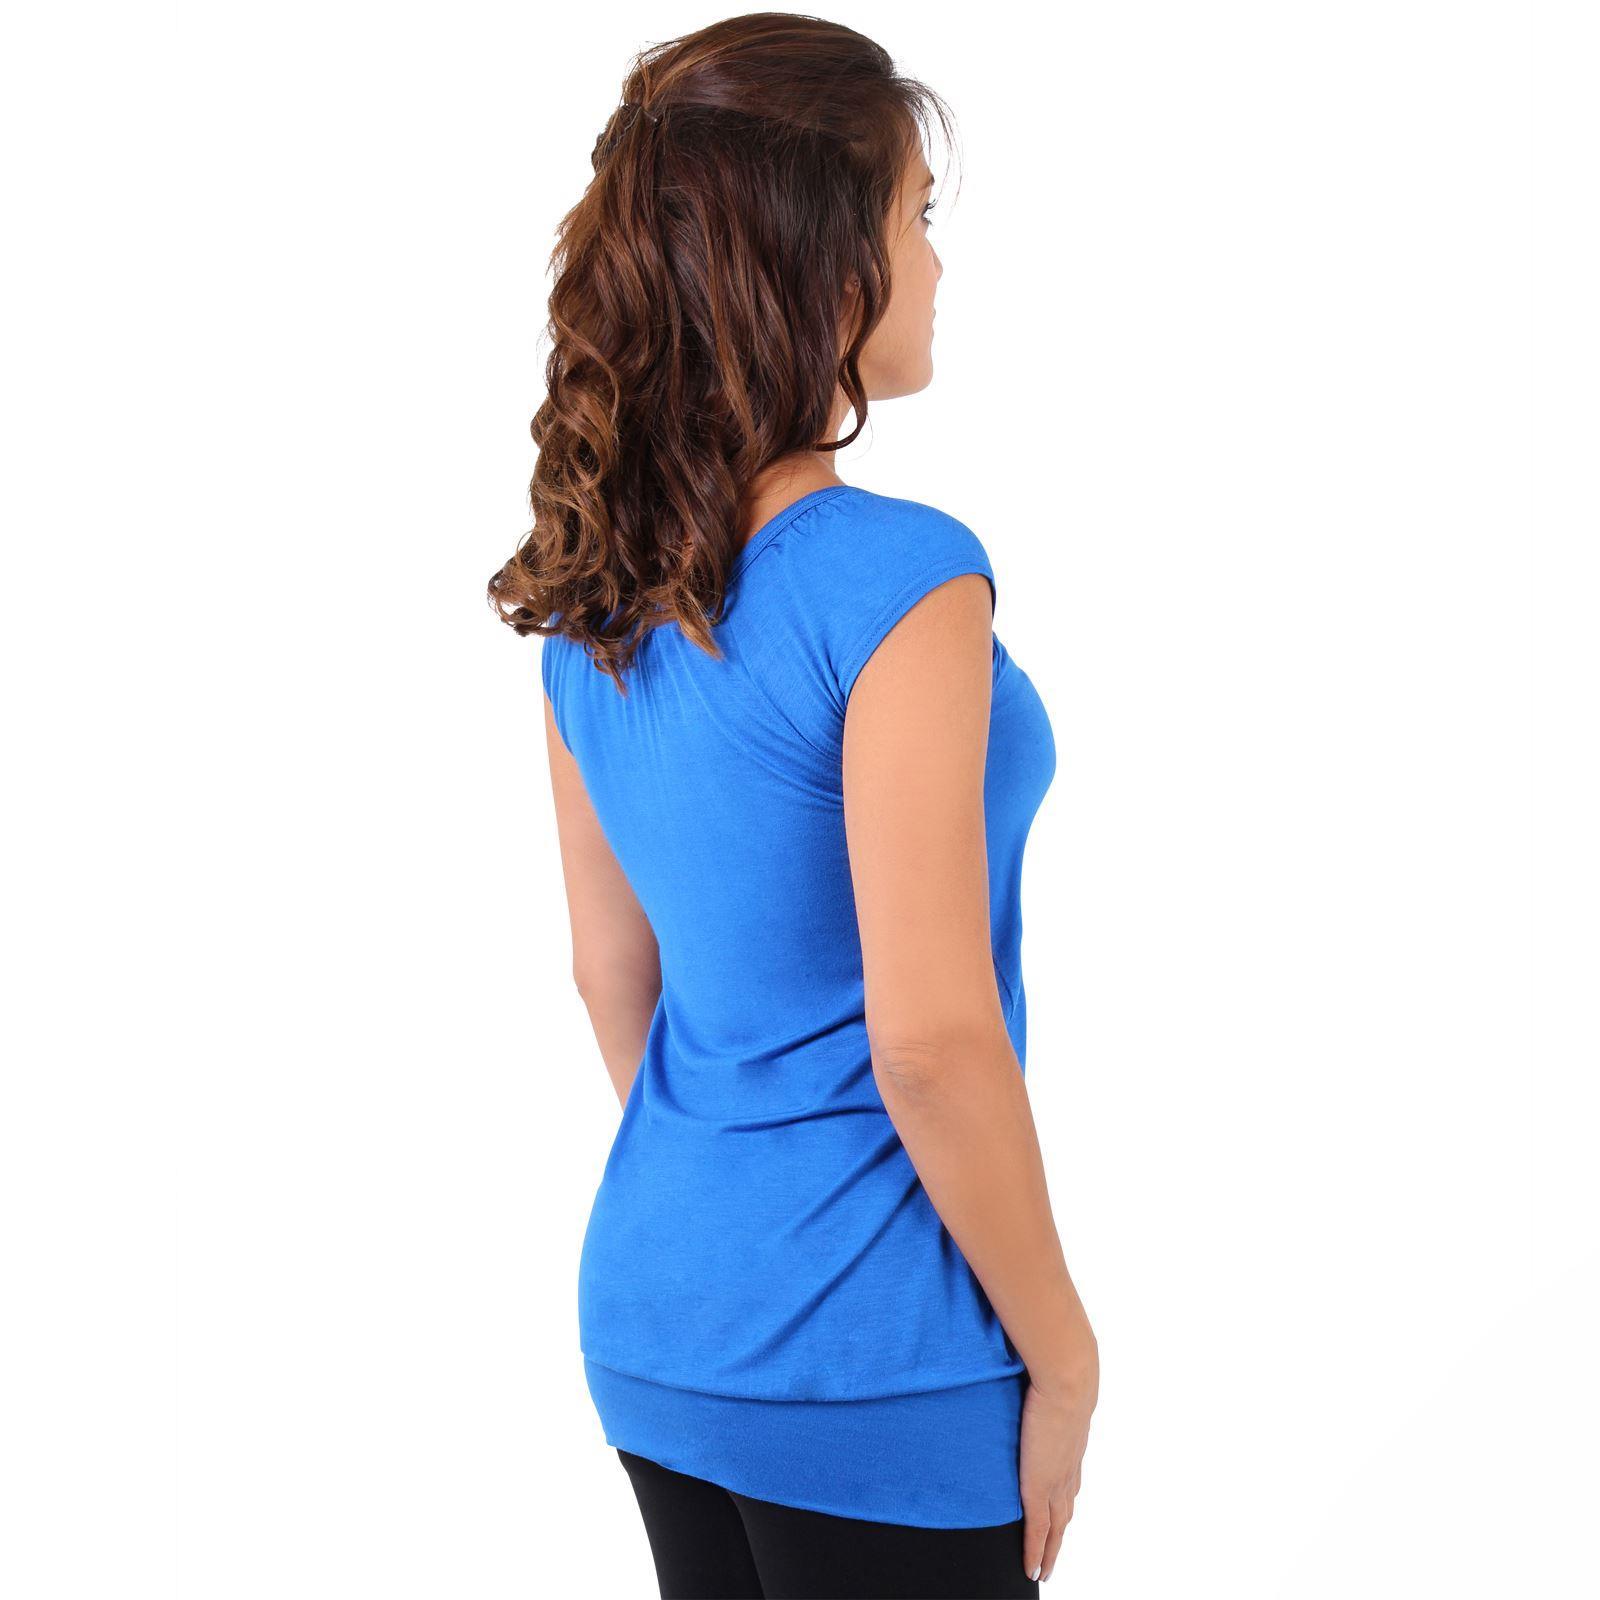 Womens-Ladies-Plain-T-Shirt-Short-Sleeve-Long-Loose-V-Neck-Blouse-Tunic-Top thumbnail 53